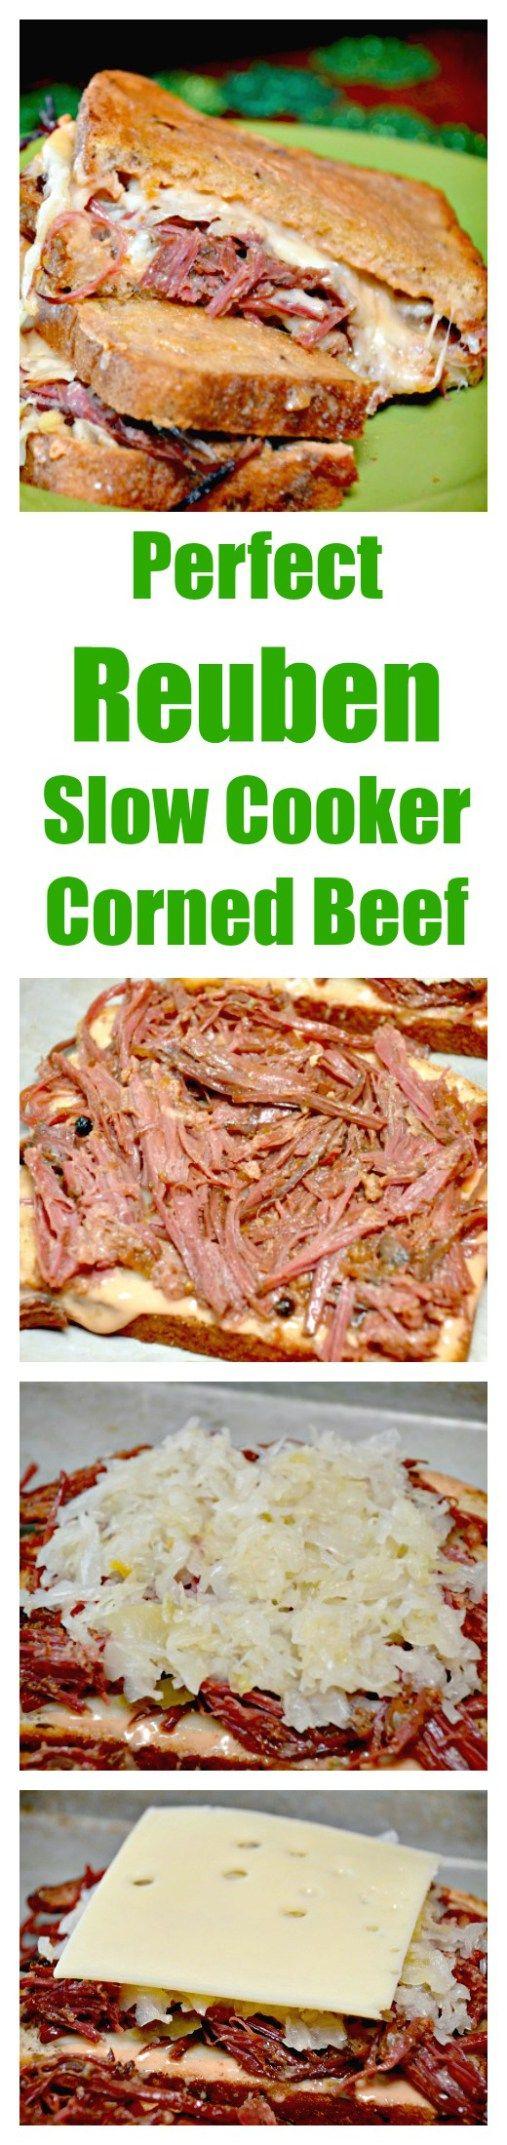 Crockpot corned beef Hash & Reuben Sandwiches perfect for St. Patricks Days